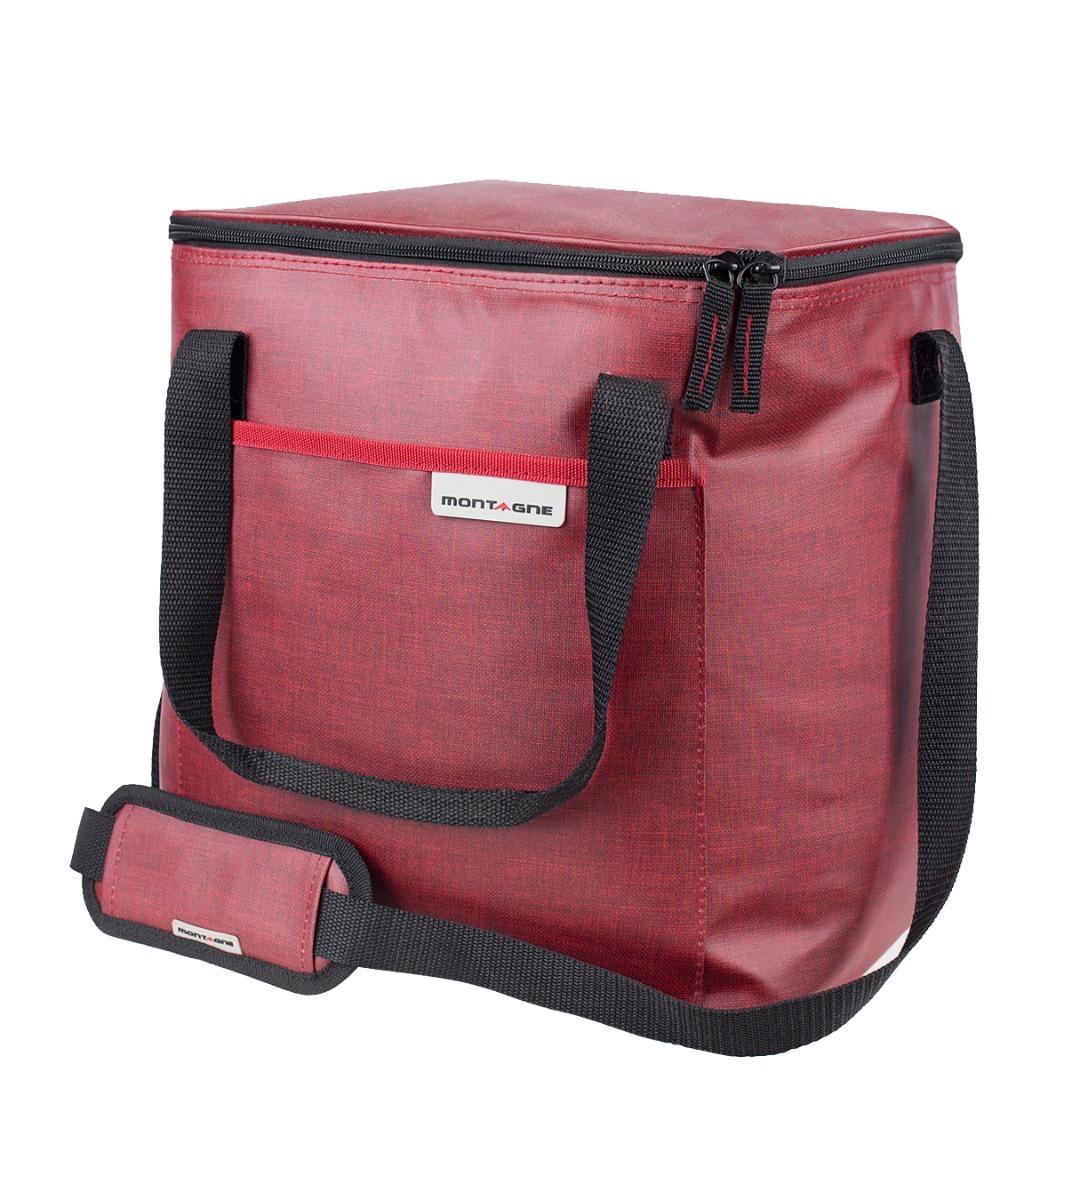 Bolso Montagne Cooler Bag 20 Lts Flap Camping -   1.400 7579bdeb733c